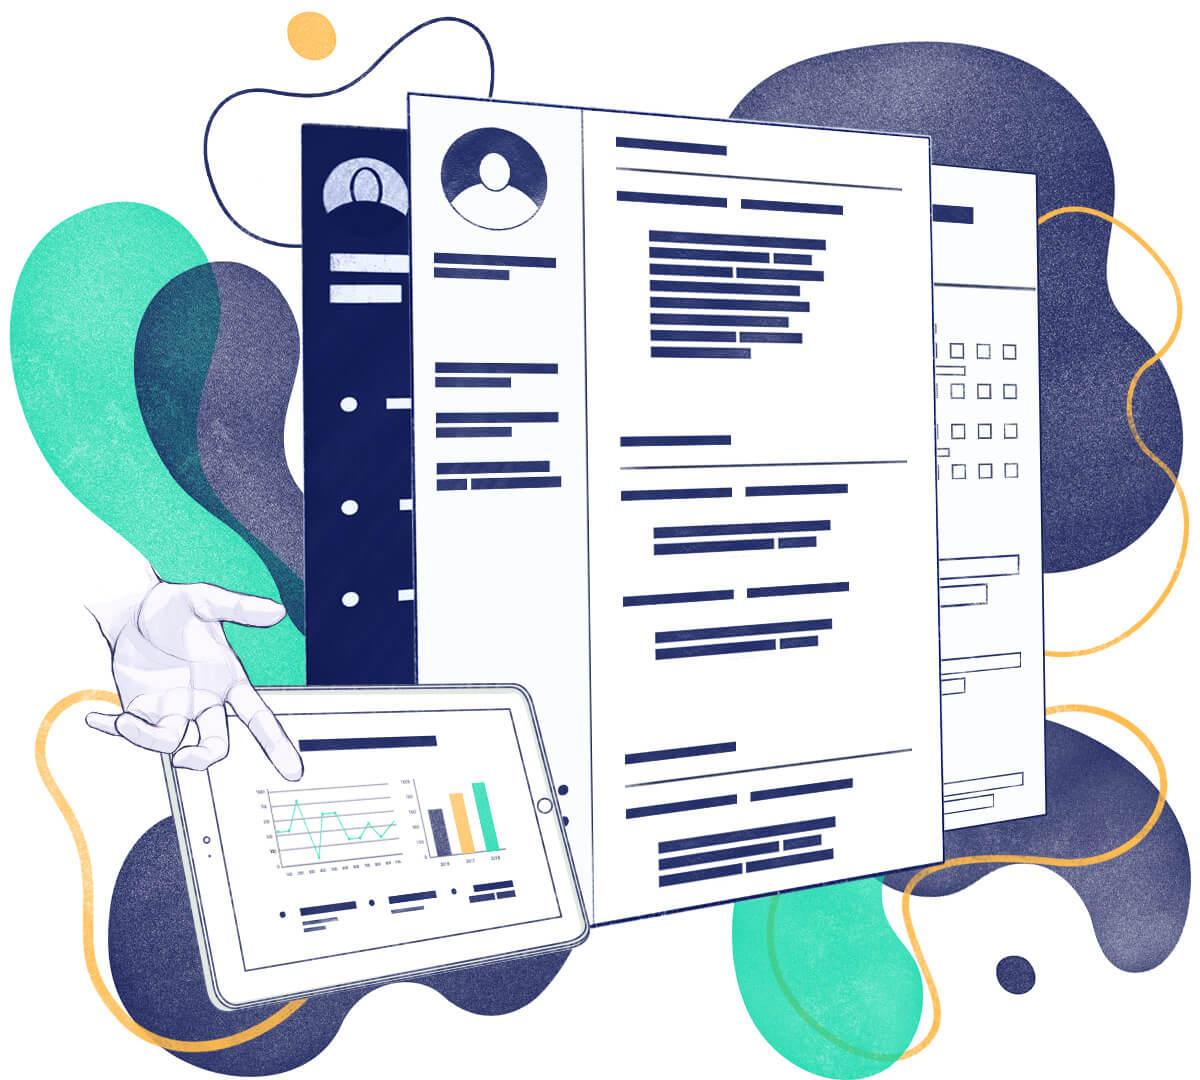 Sales Representative CV Examples for 2021 (Template, Skills, Duties)